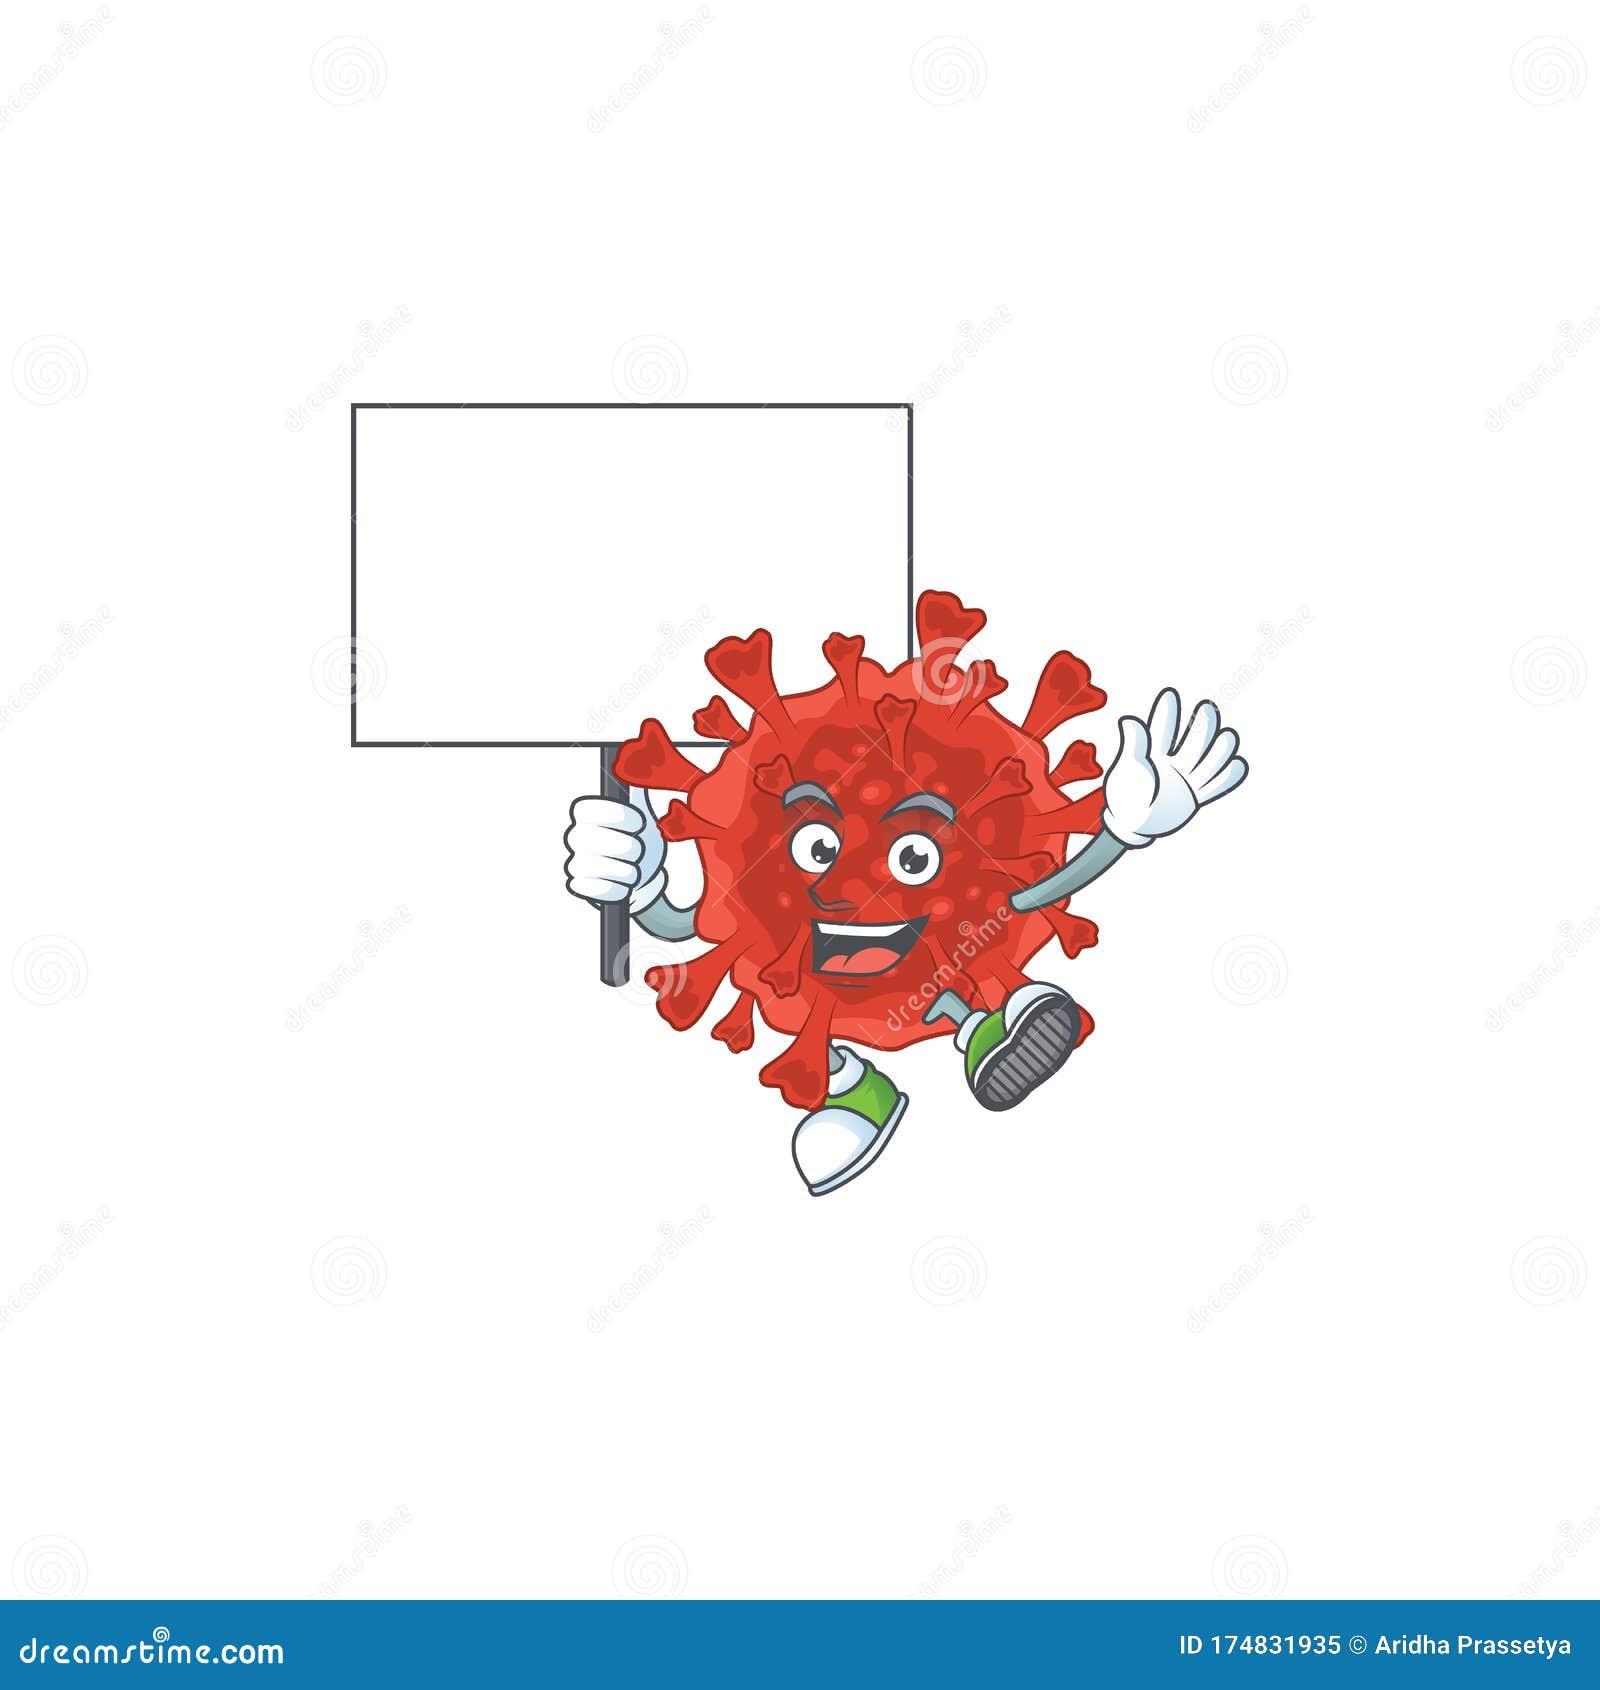 Sweet Red Corona Virus Cartoon Character Bring A Board Stock Vector Illustration Of Disease Hospital 174831935